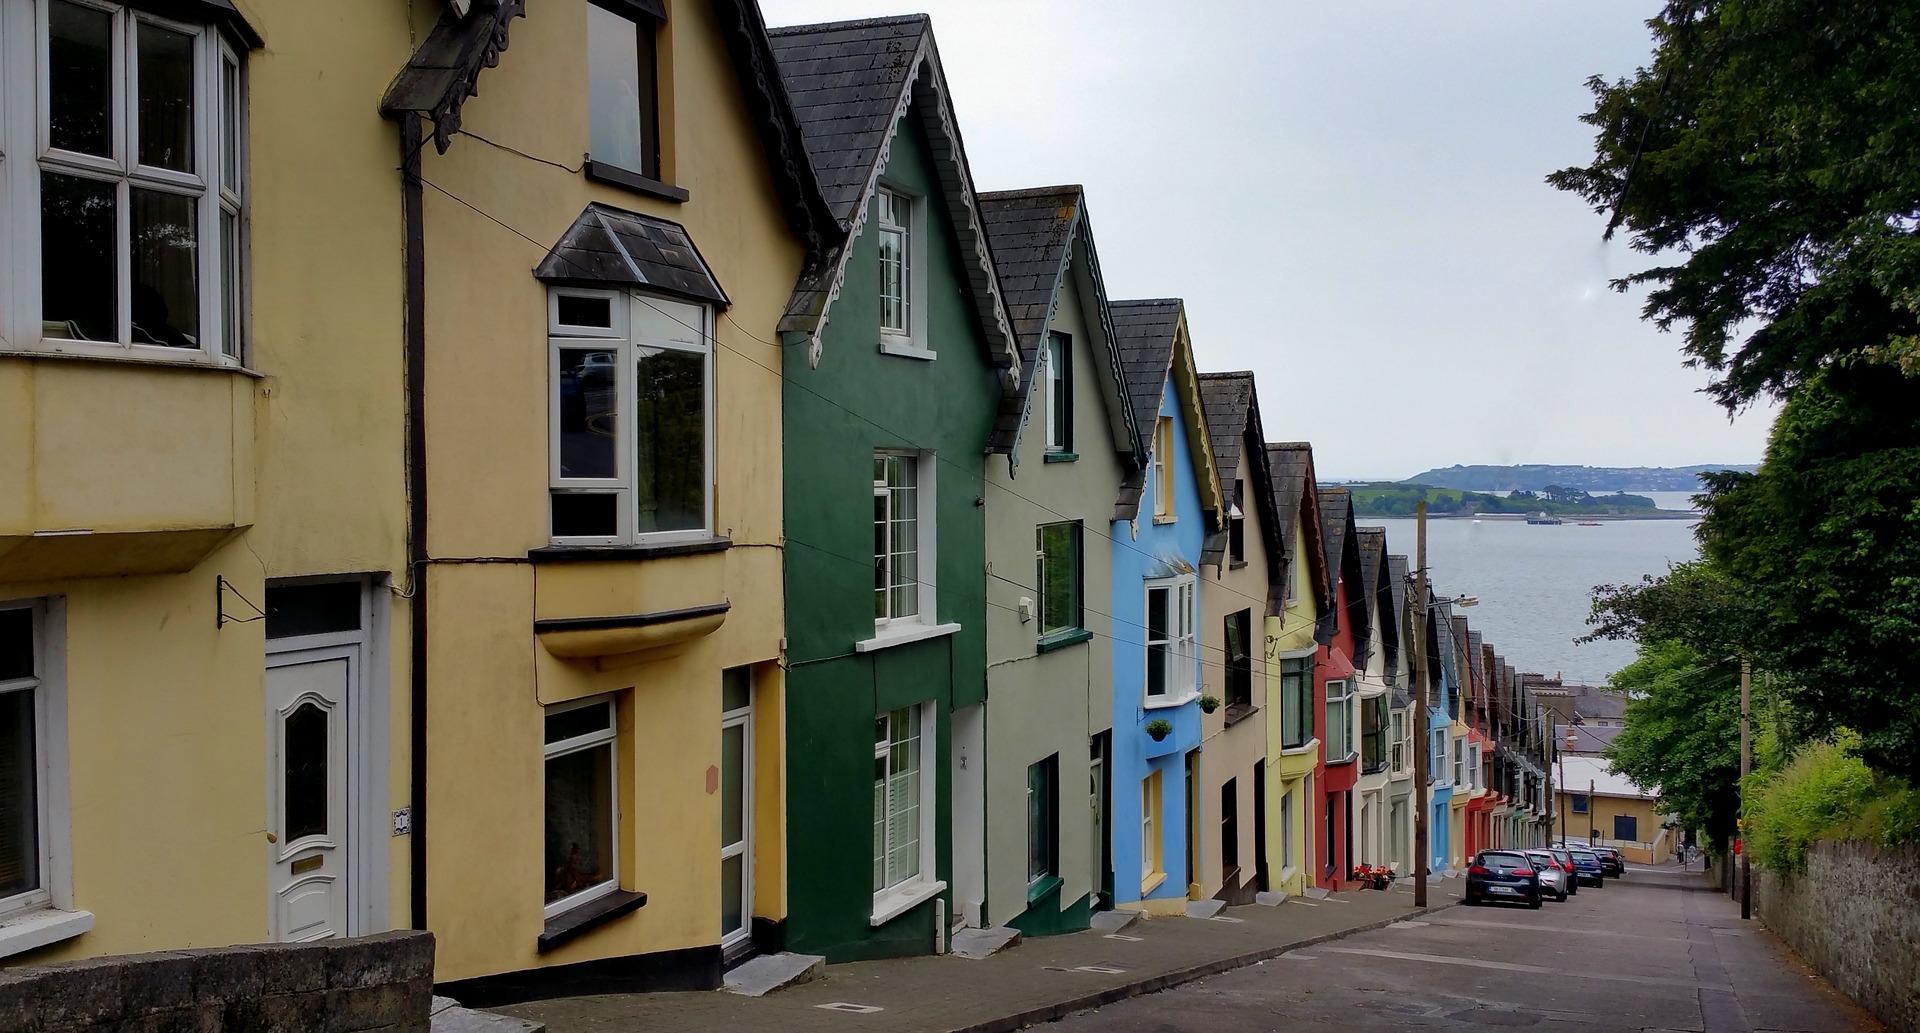 Irish homes descending on a hill